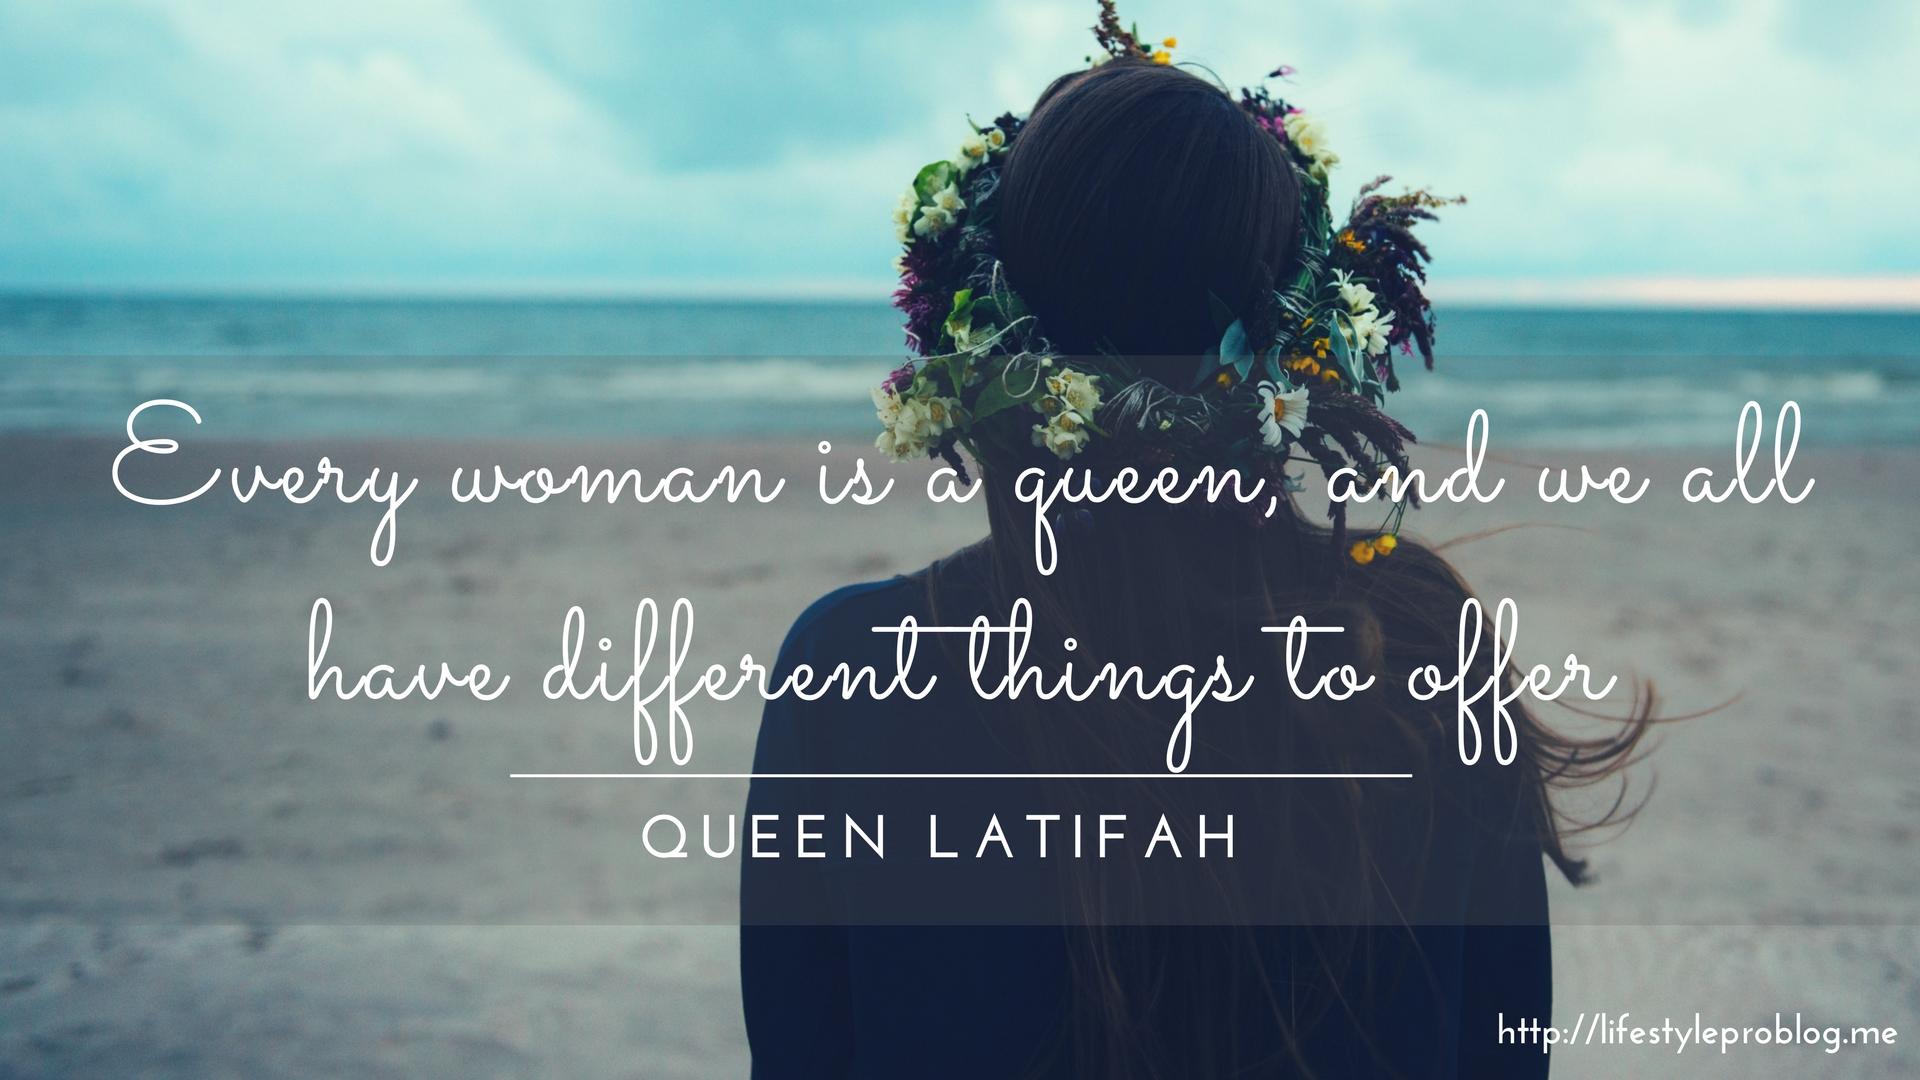 #AtoZChallenge : Queen Latifah Quote